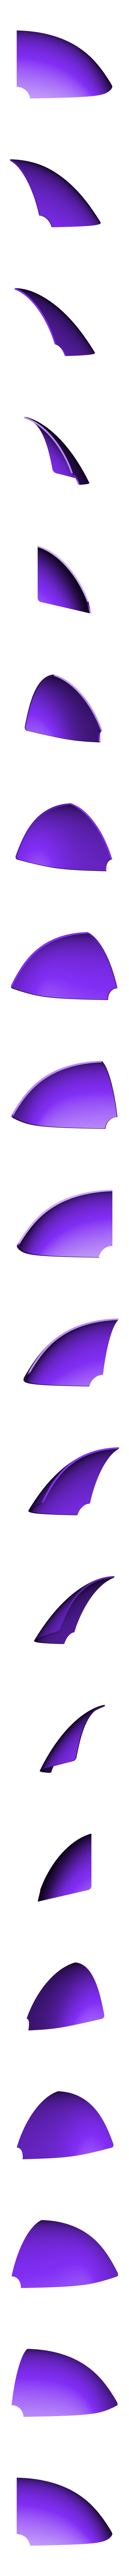 TMBackPanelA.stl Download free STL file TELEAVIA MATRIX • 3D printable design, Qelorliss